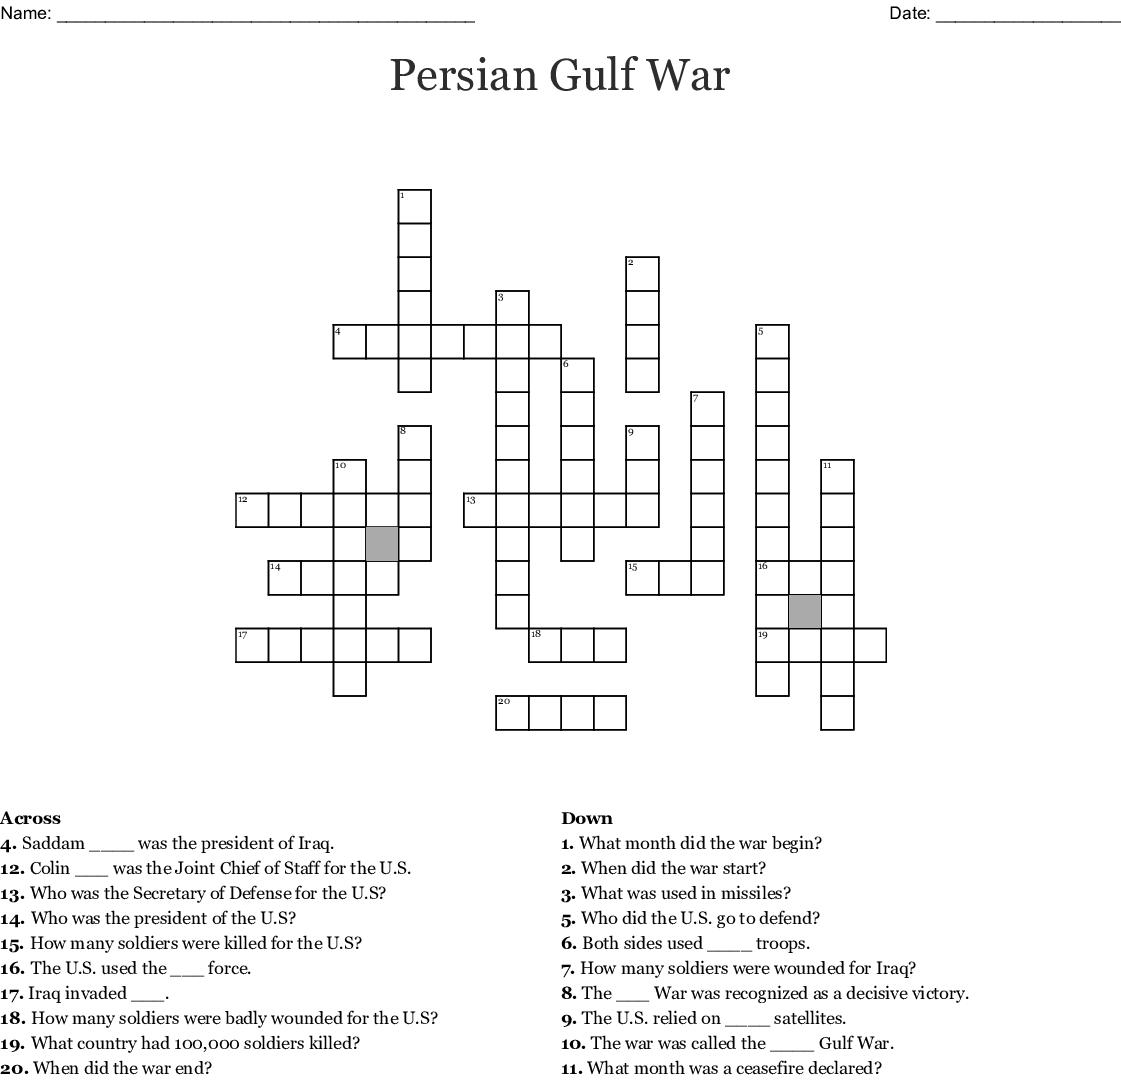 Persian Gulf War Crossword